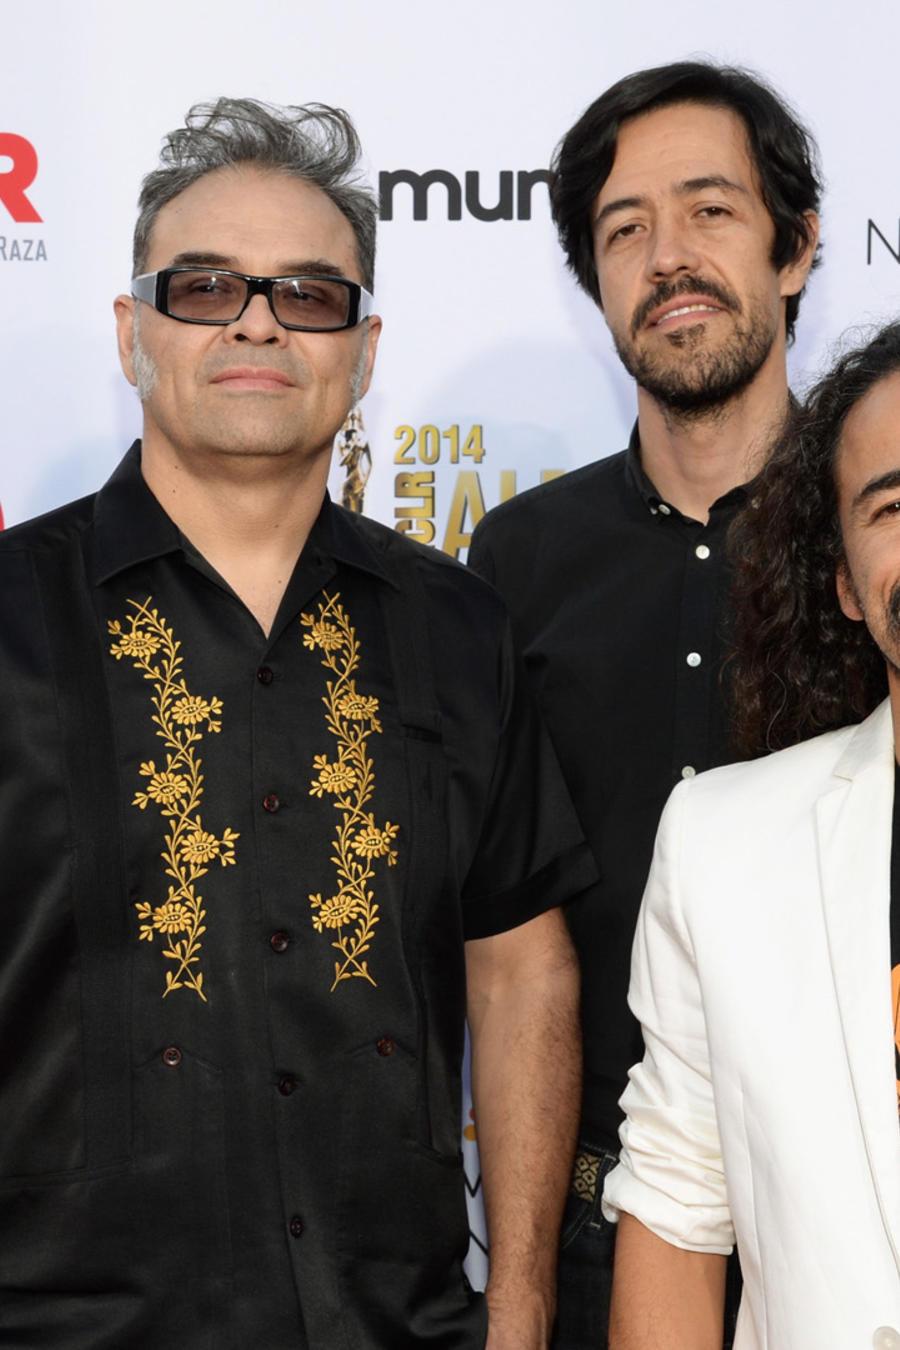 Cafe Tacvba en los ALMA Awards 2014 en Pasadena Civic Auditorium